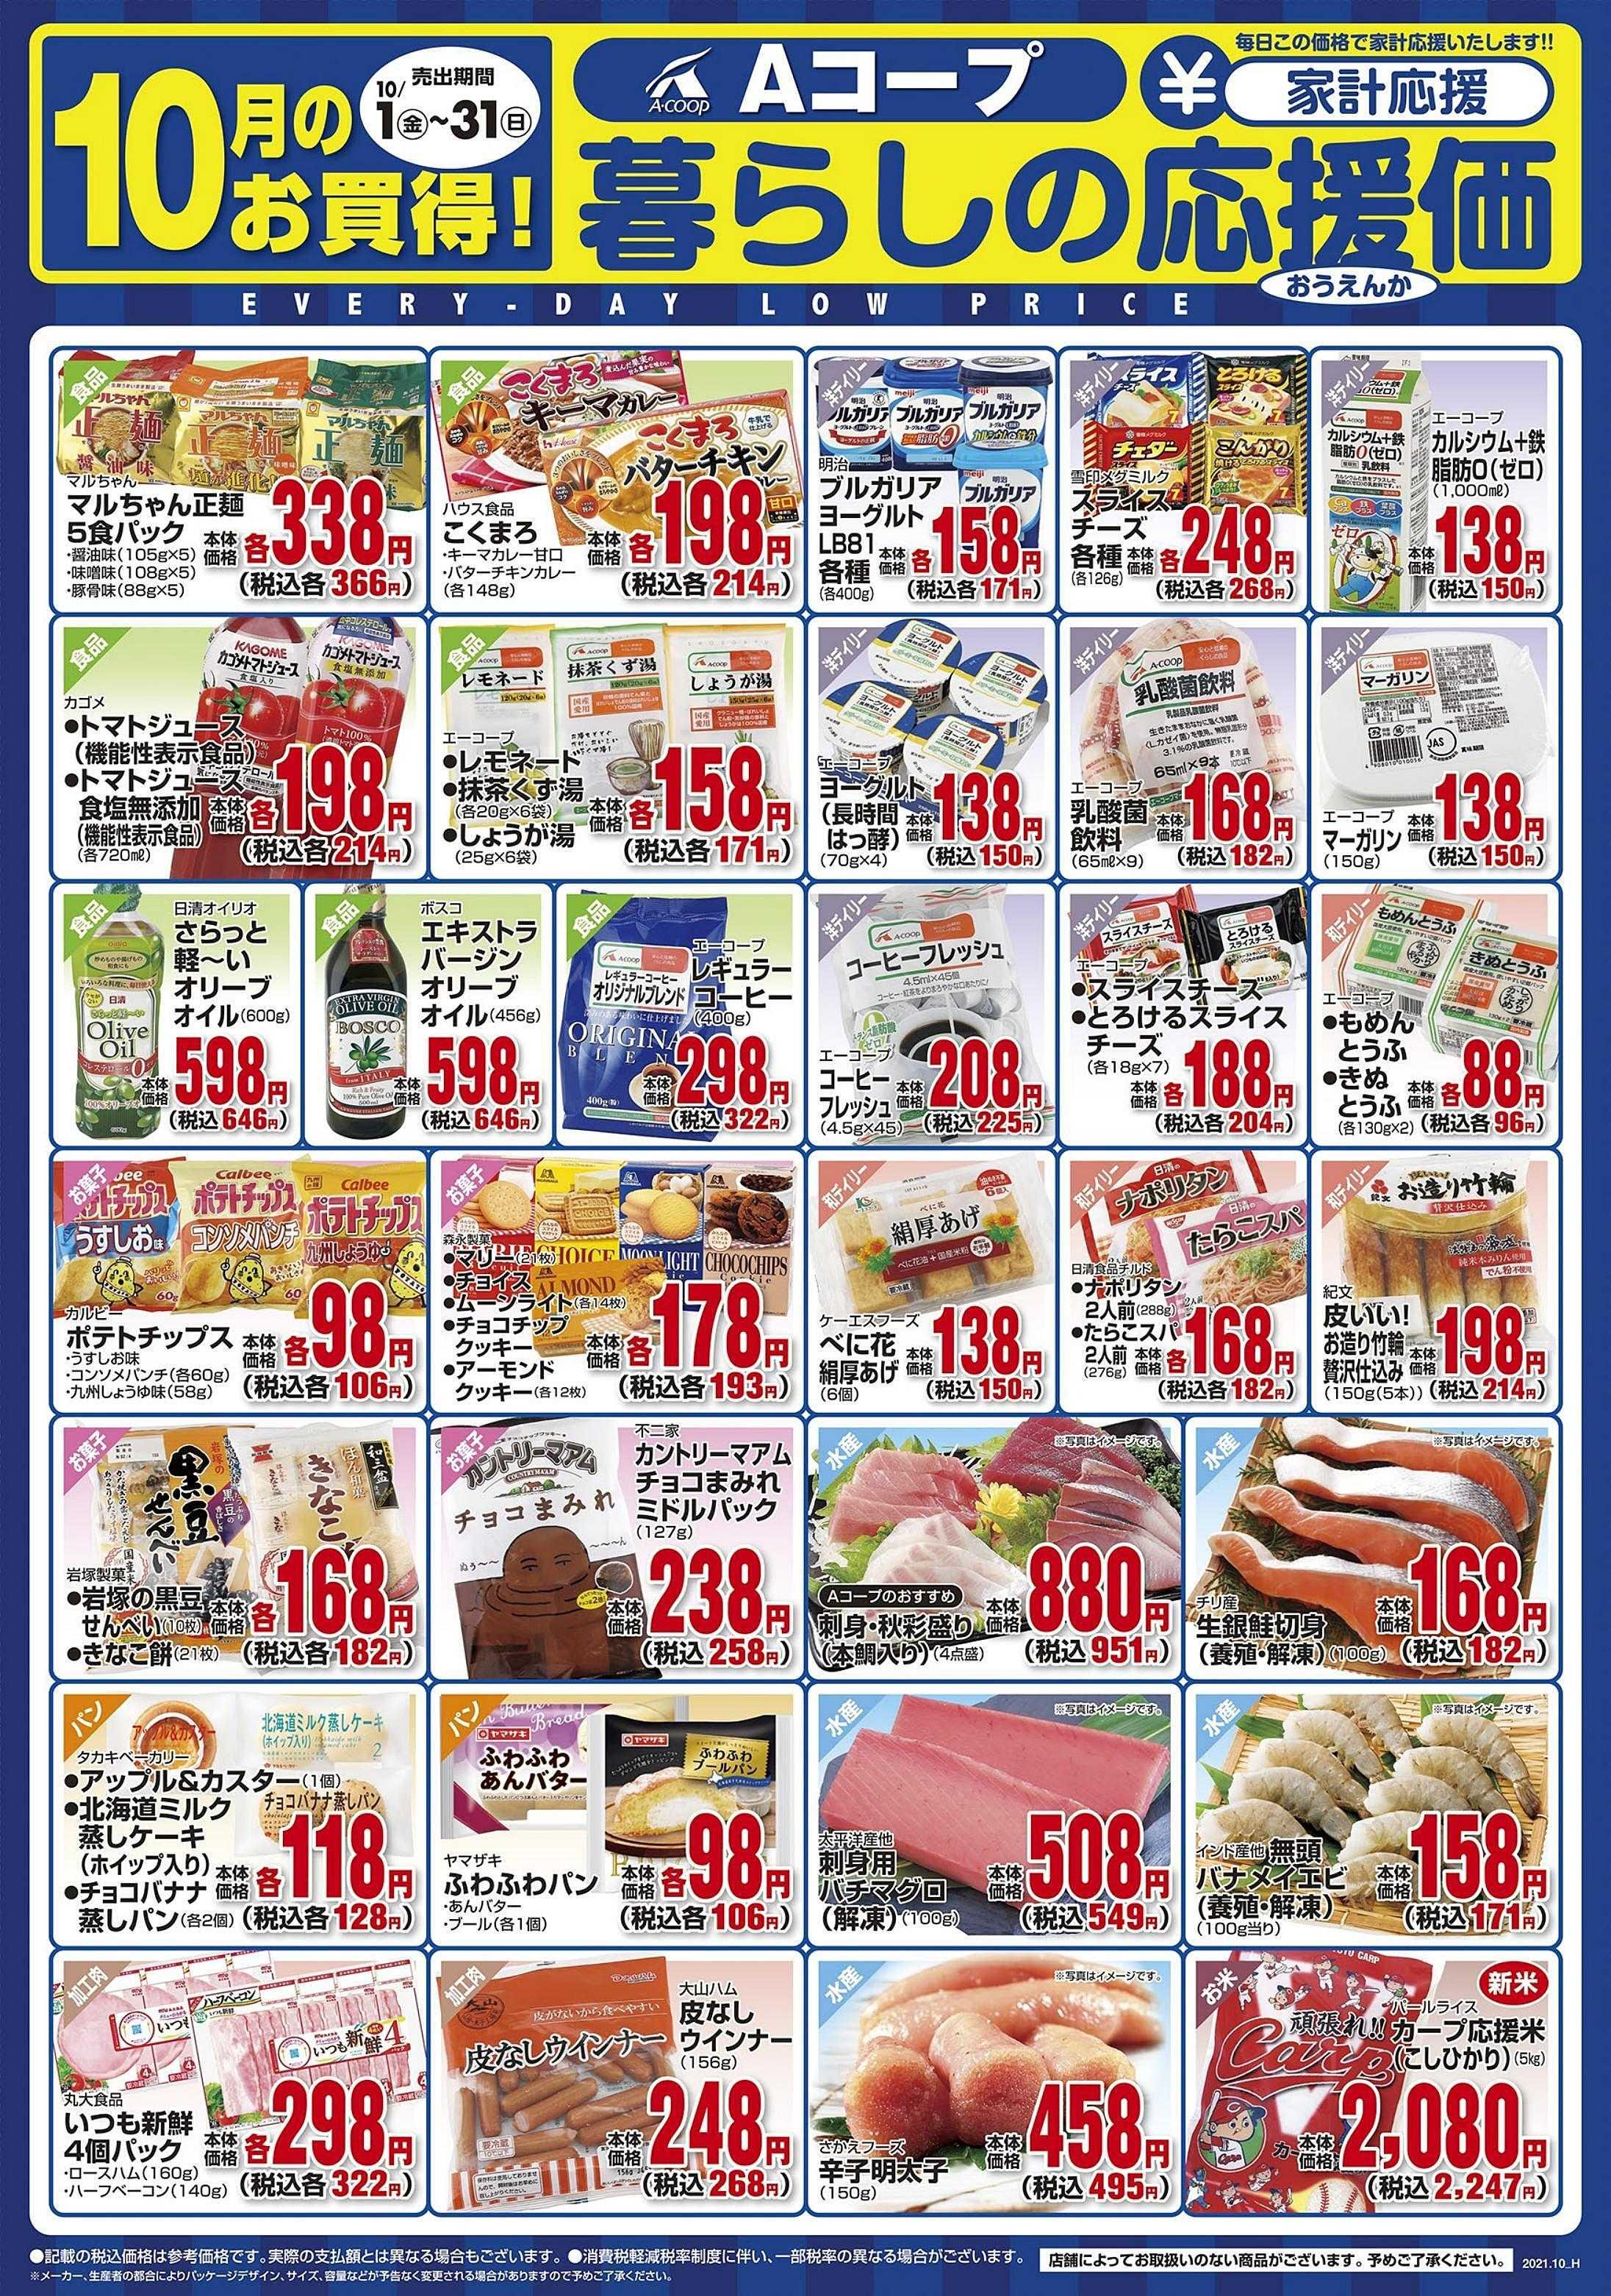 Aコープ西日本 10月の『暮らしの応援価』